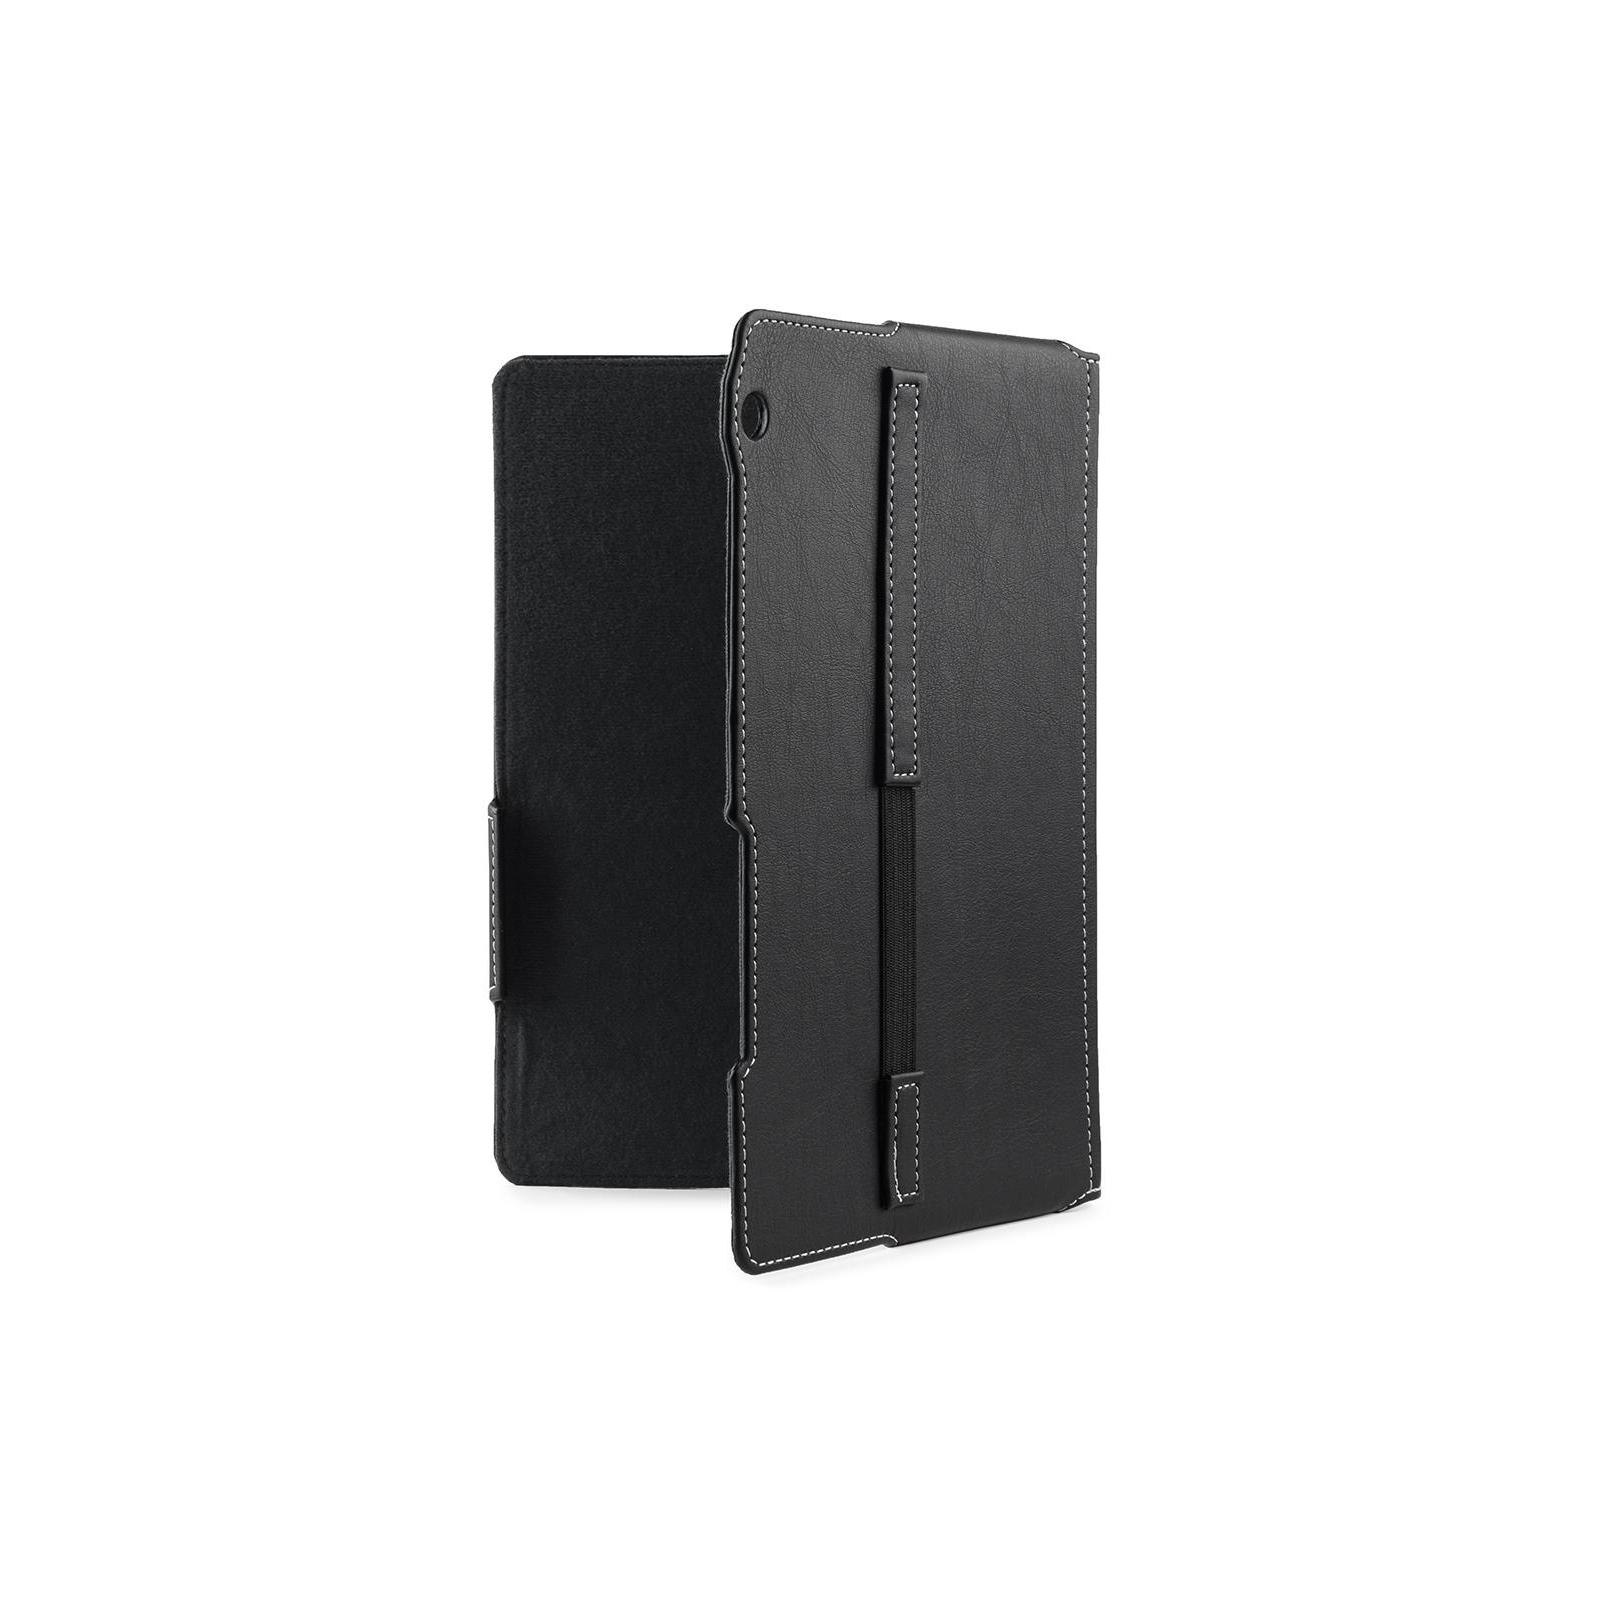 Чехол для планшета Huawei MediaPad T3 10 black Vinga (VNT3753010) изображение 2